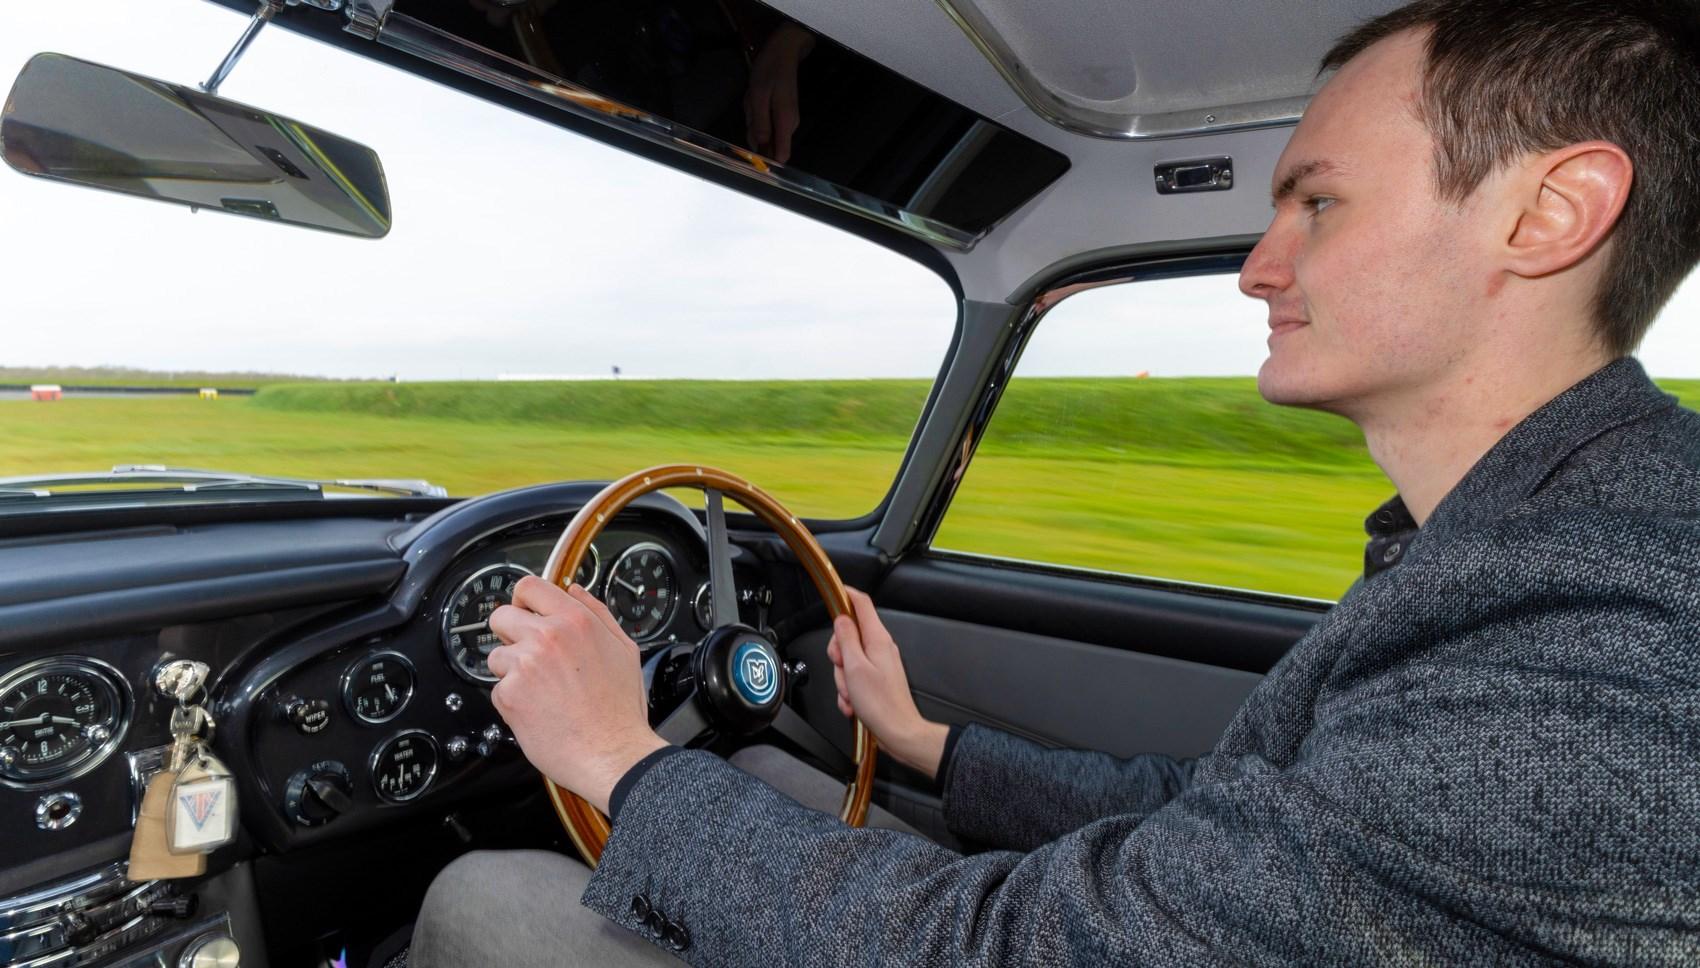 DB5 Jake driving